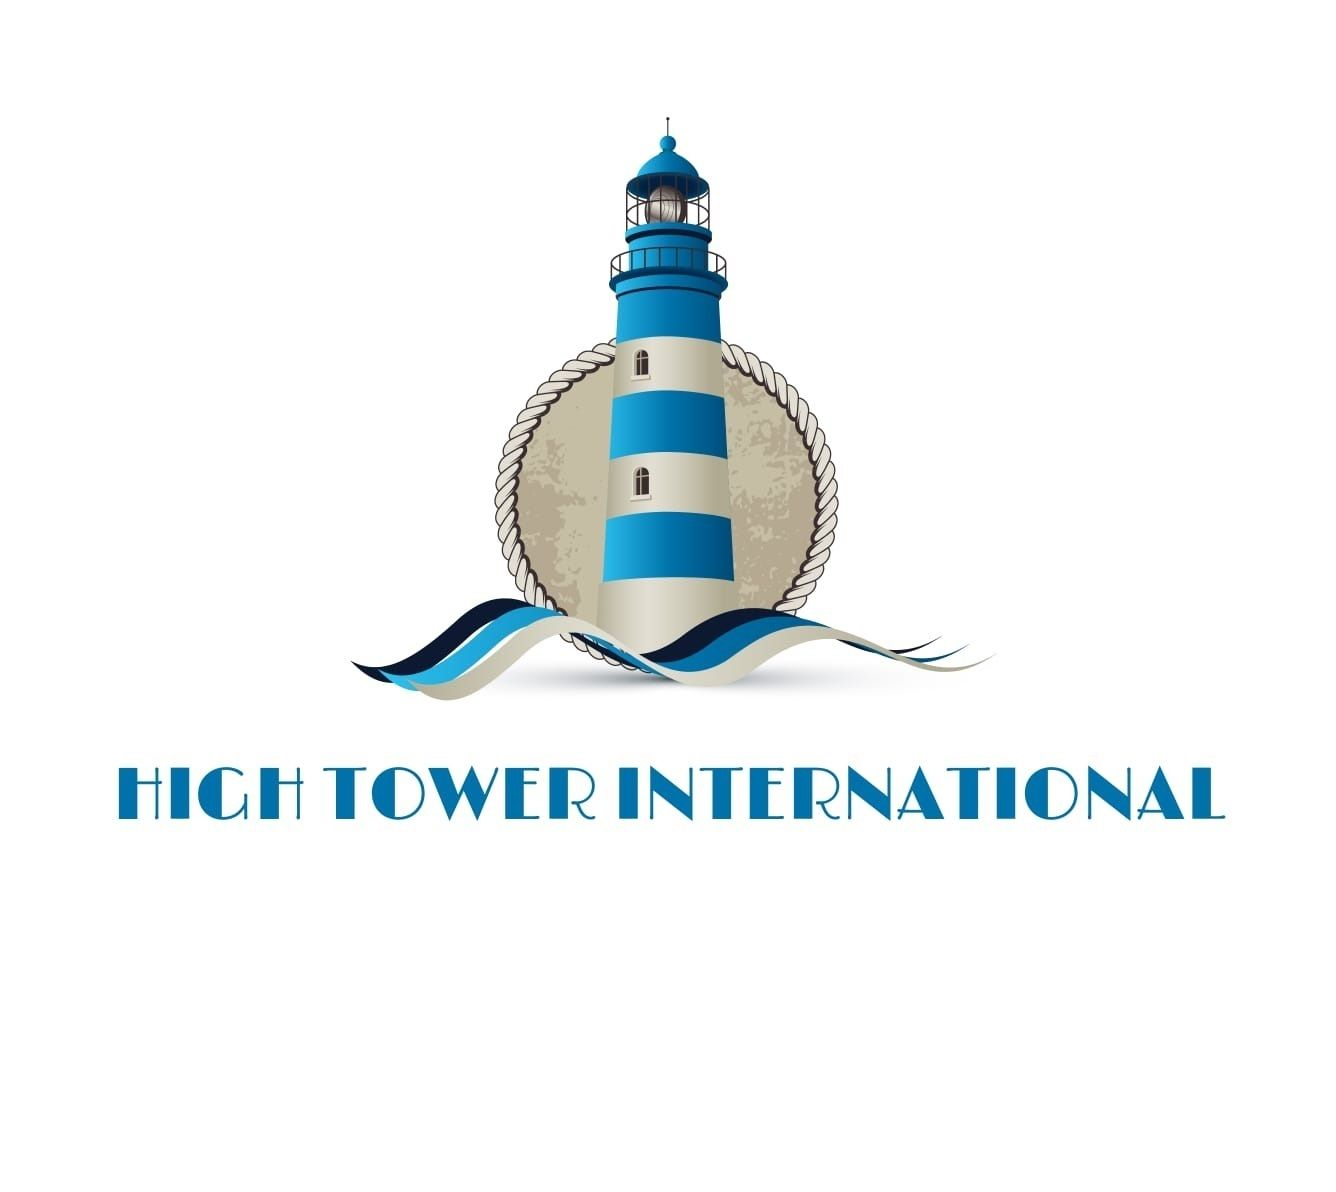 Hightower International Ltd